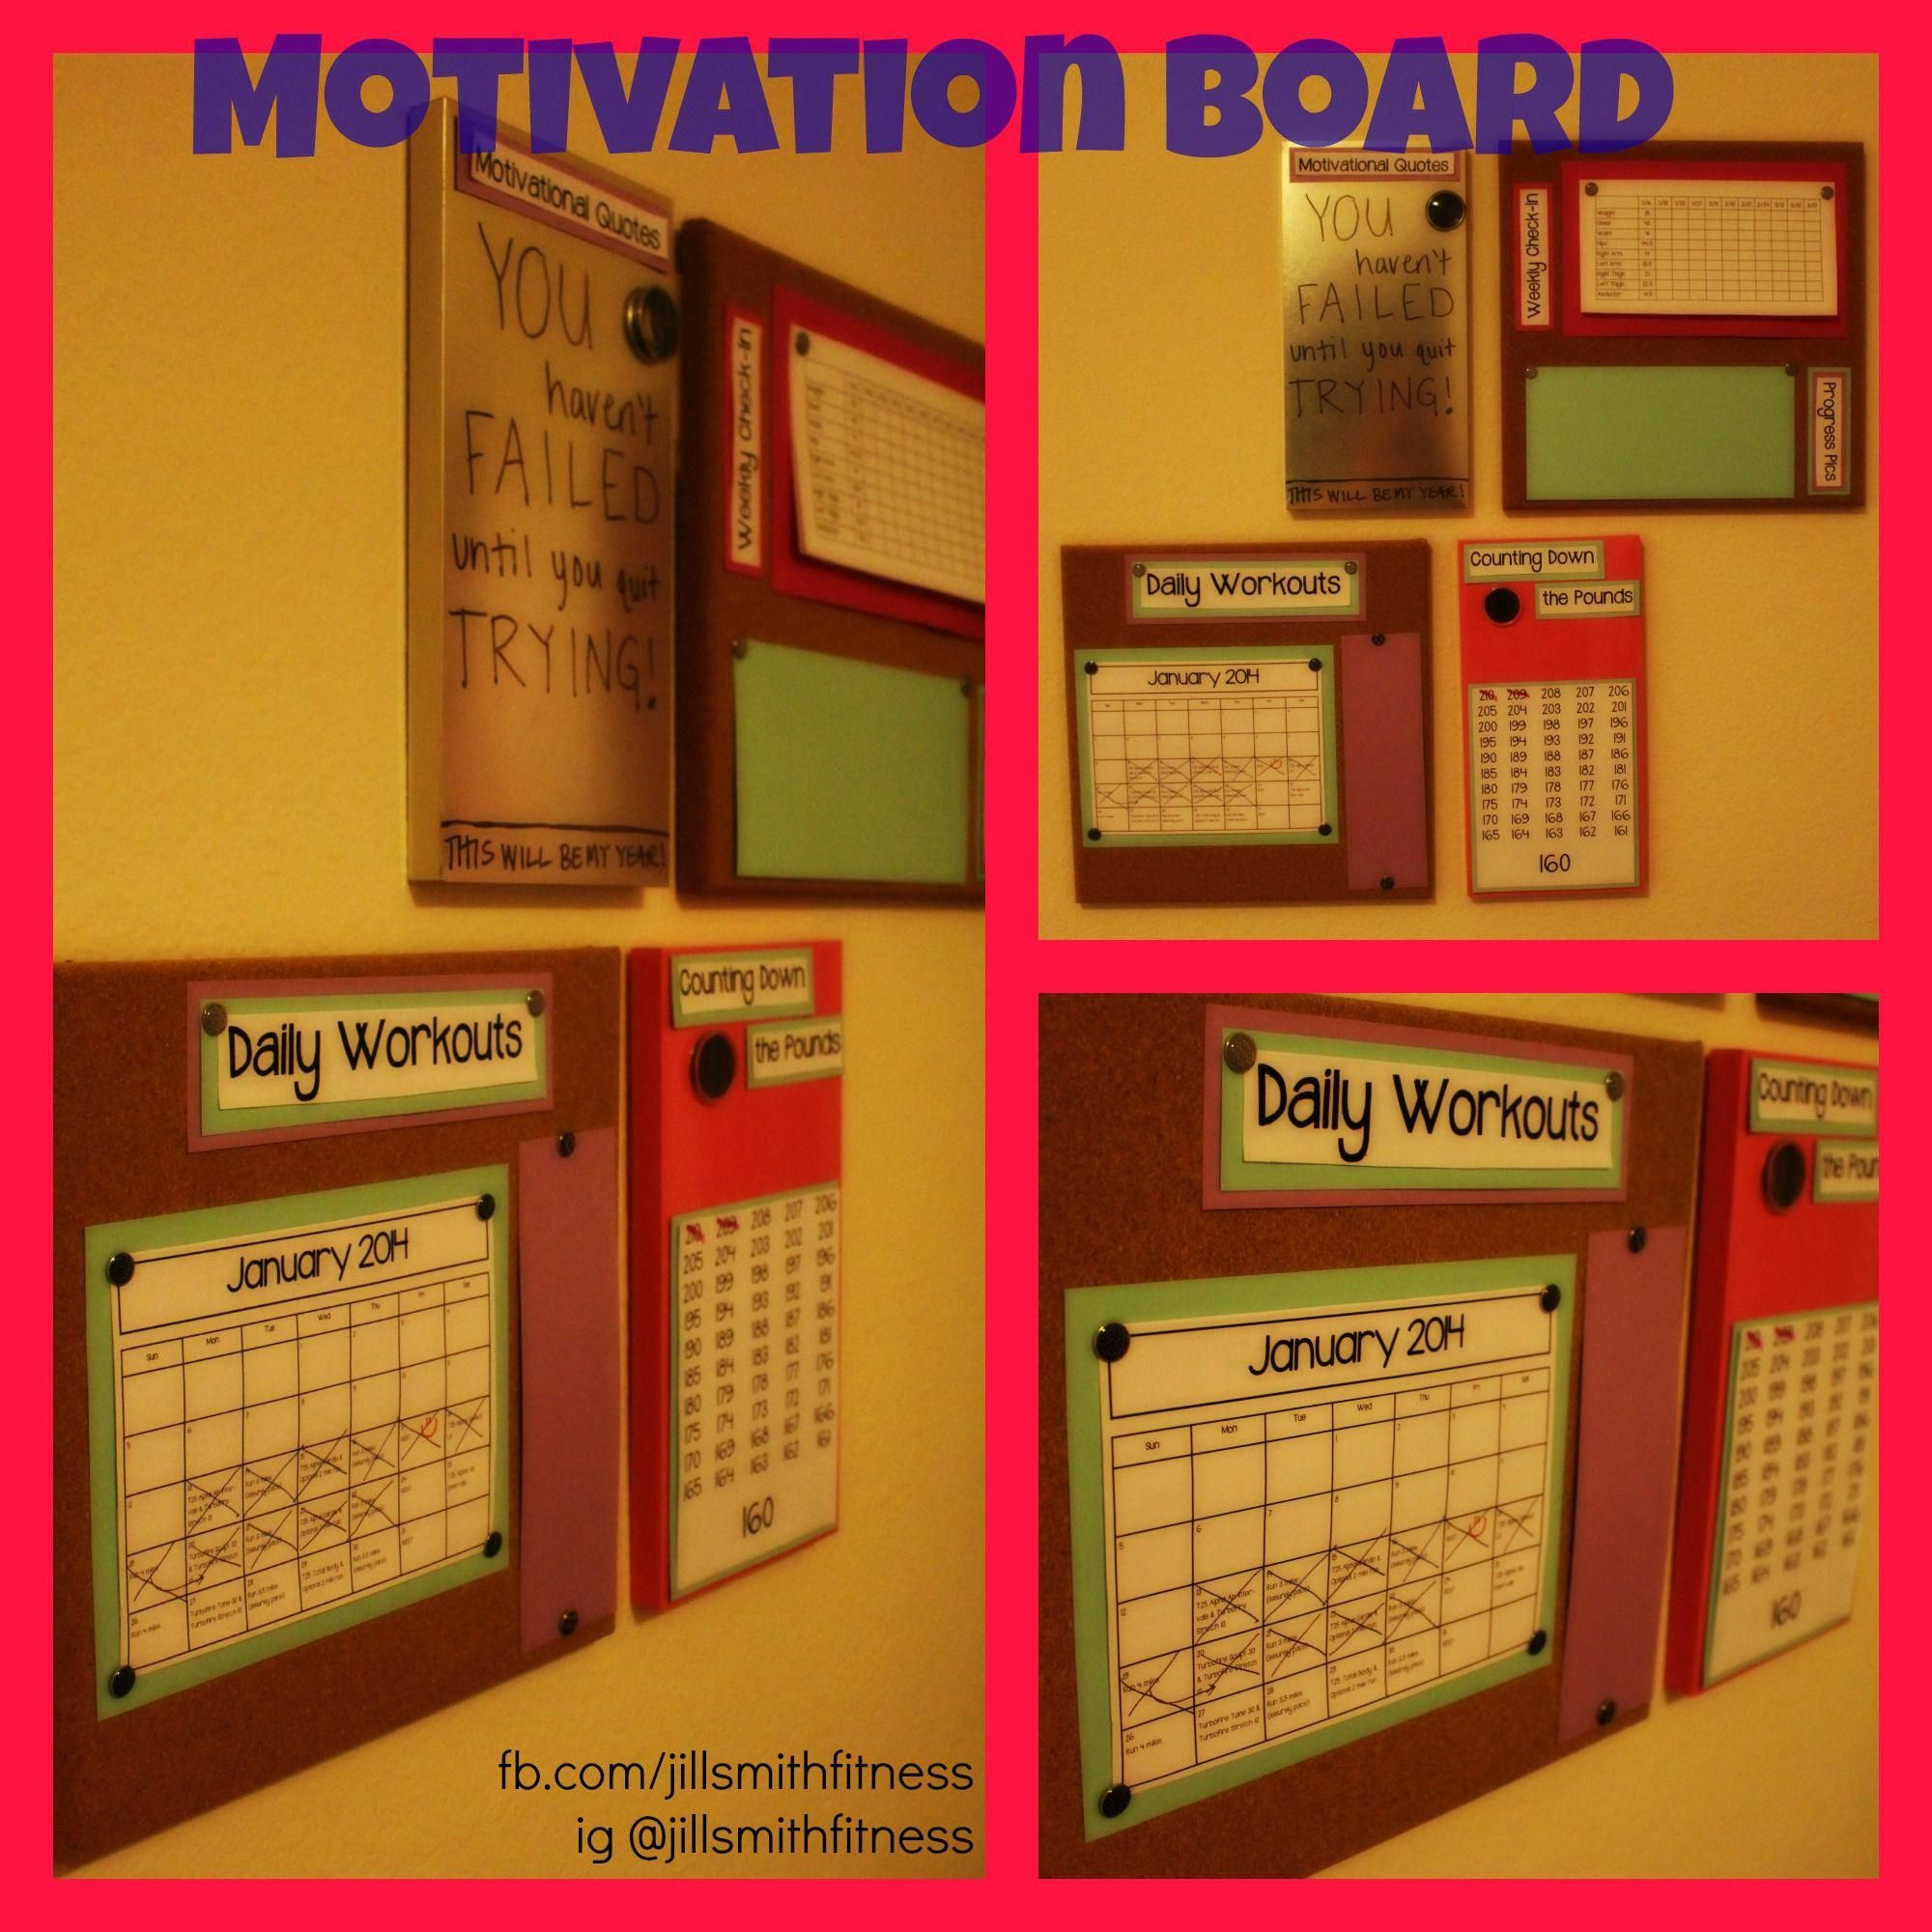 Fitness Motivation Board Fb Jillsmithfitness For More